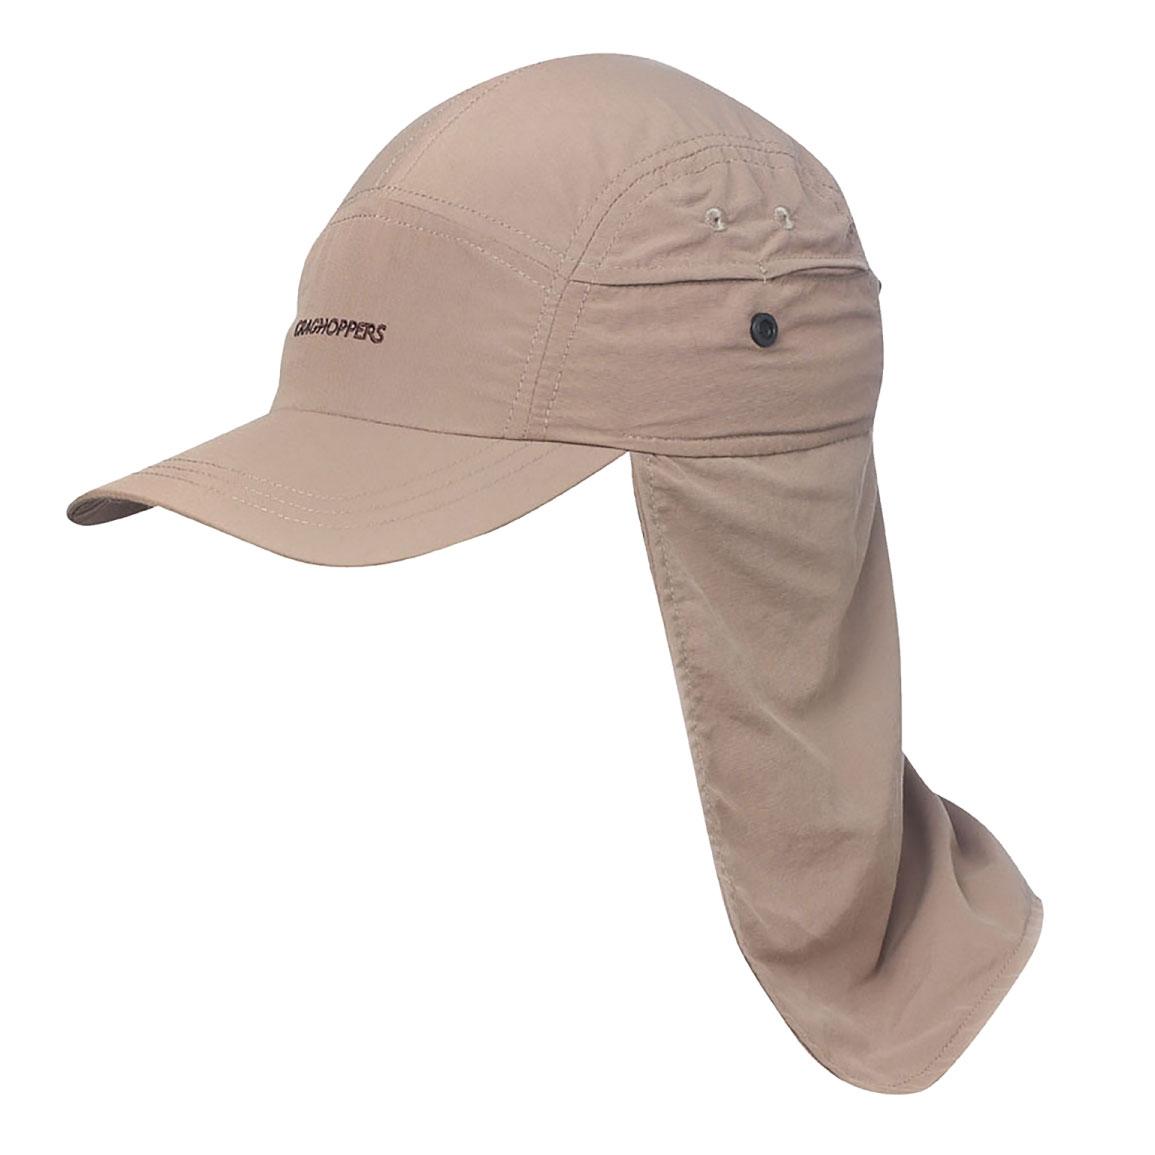 fe8edd421 Craghoppers Nosilife Desert Hat - Pebble